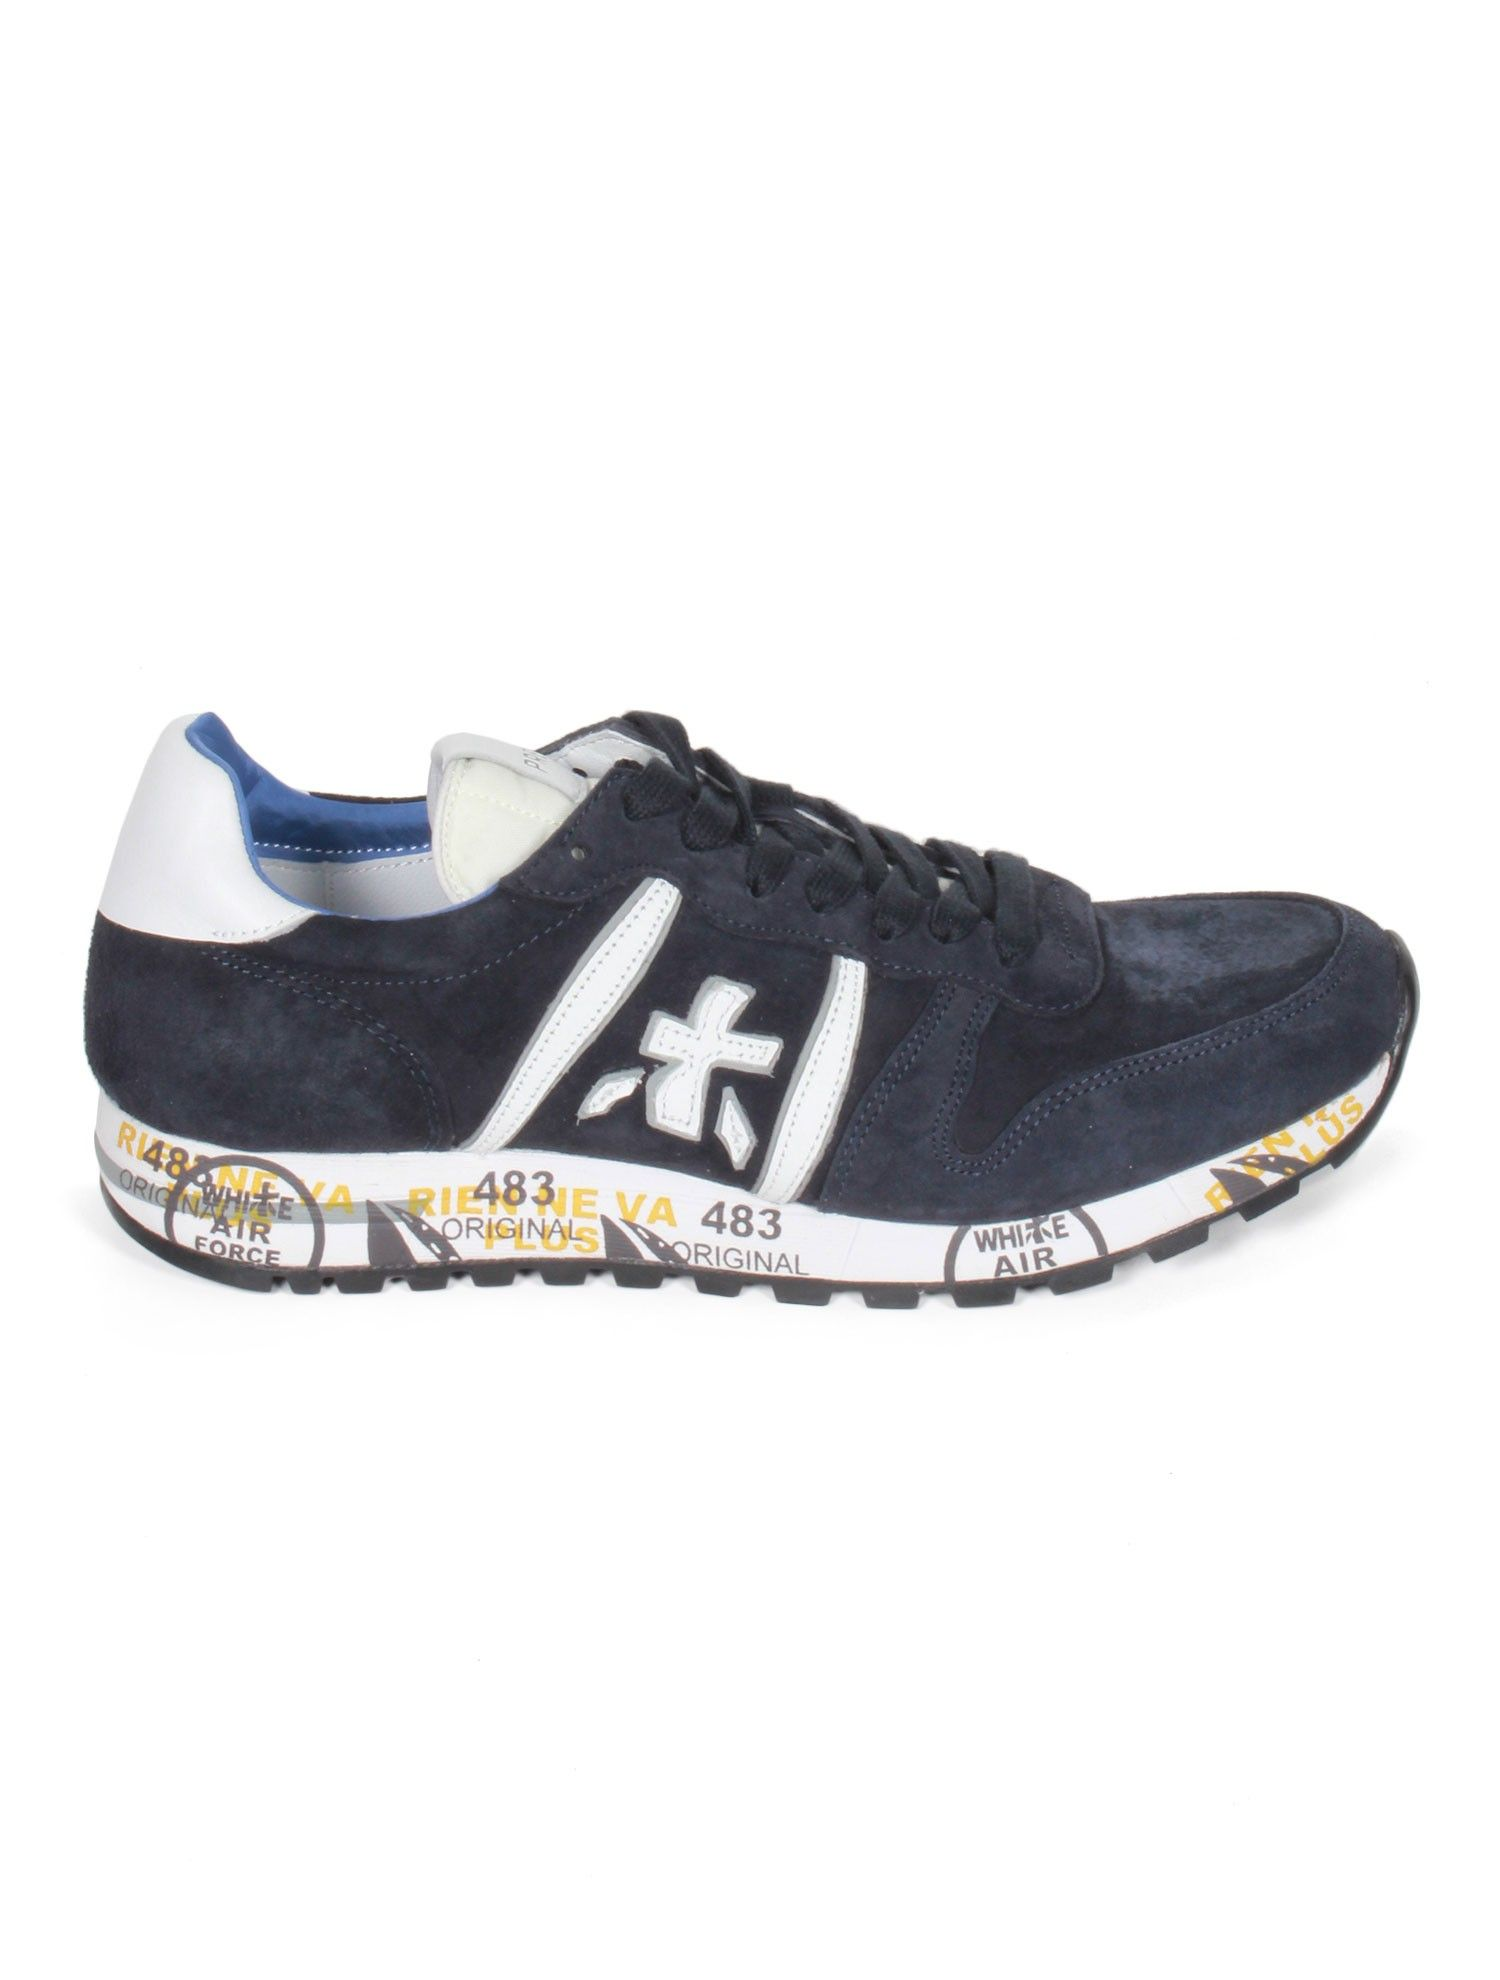 PREMIATA White Eric Men's Nubuck Sneakers - Navy - serie ||| NOIRE